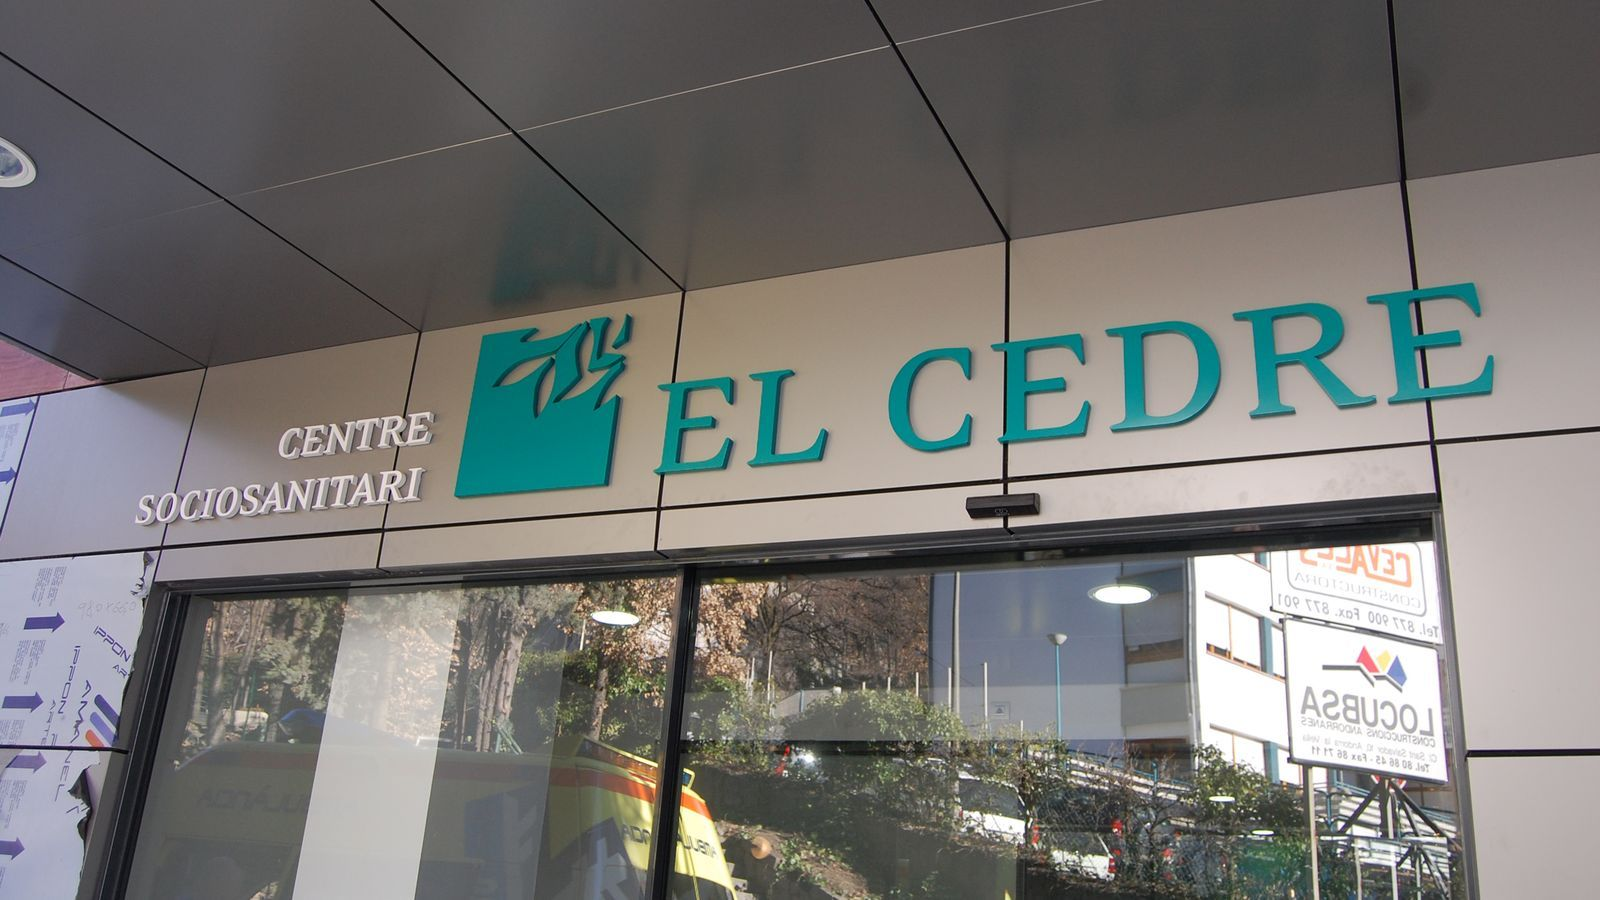 El Centre sociosanitari El Cedre. / (ANA)